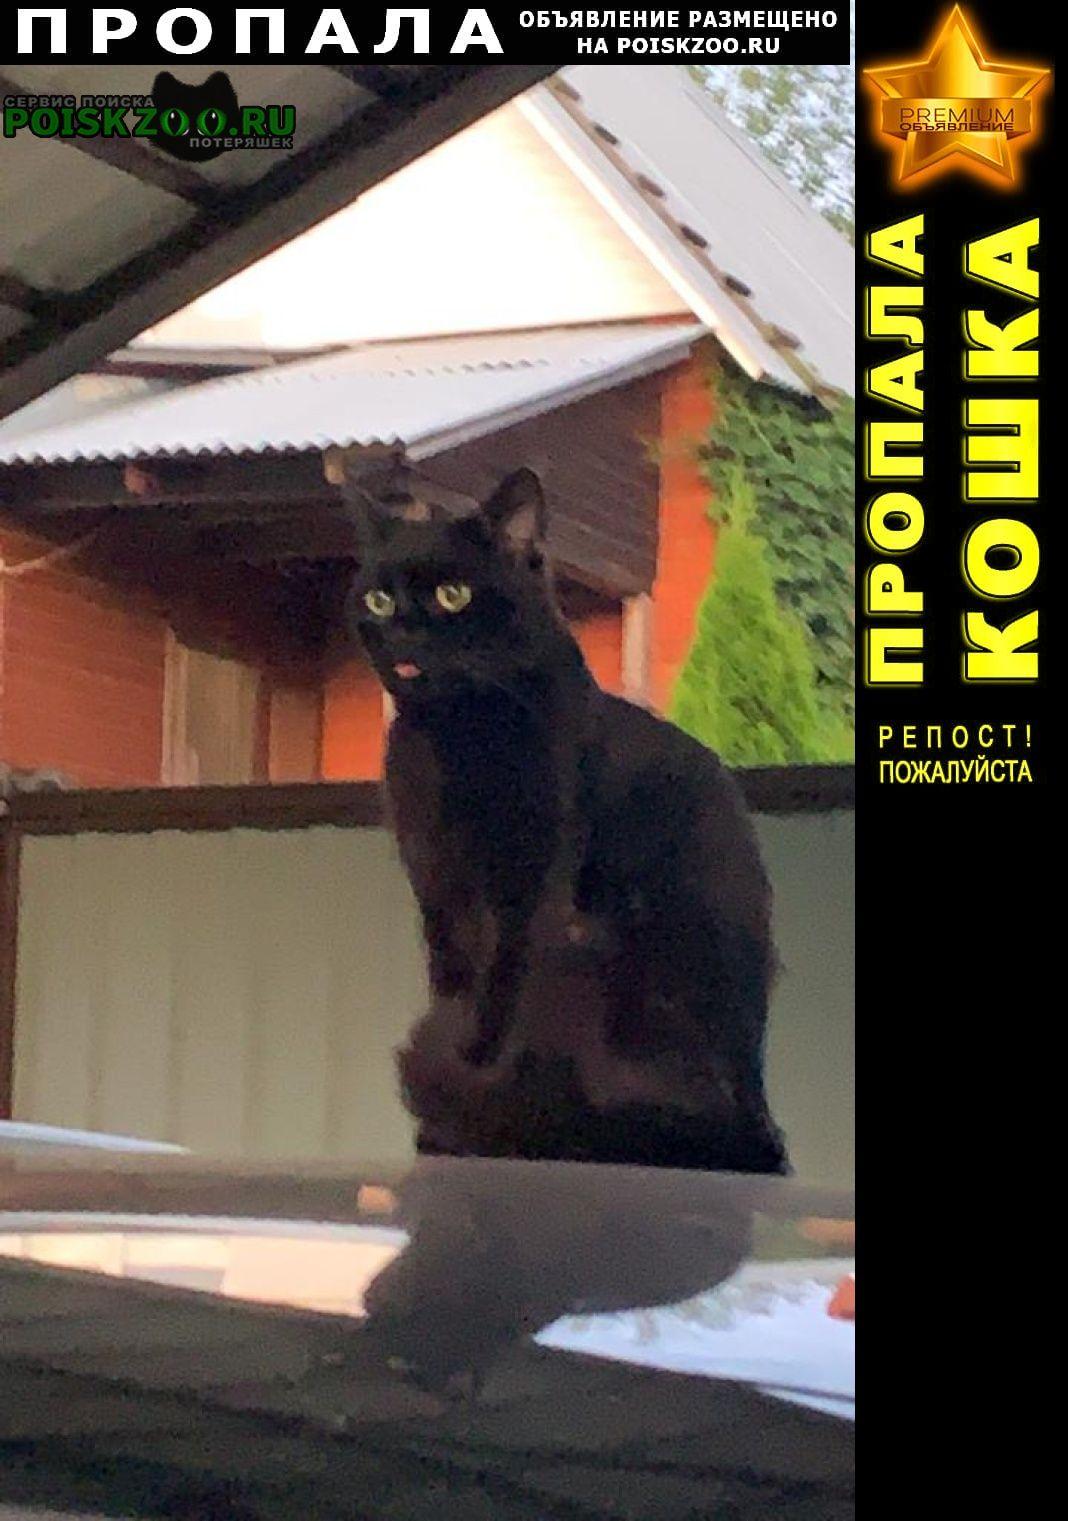 Пропала кошка чёрный кот Апрелевка